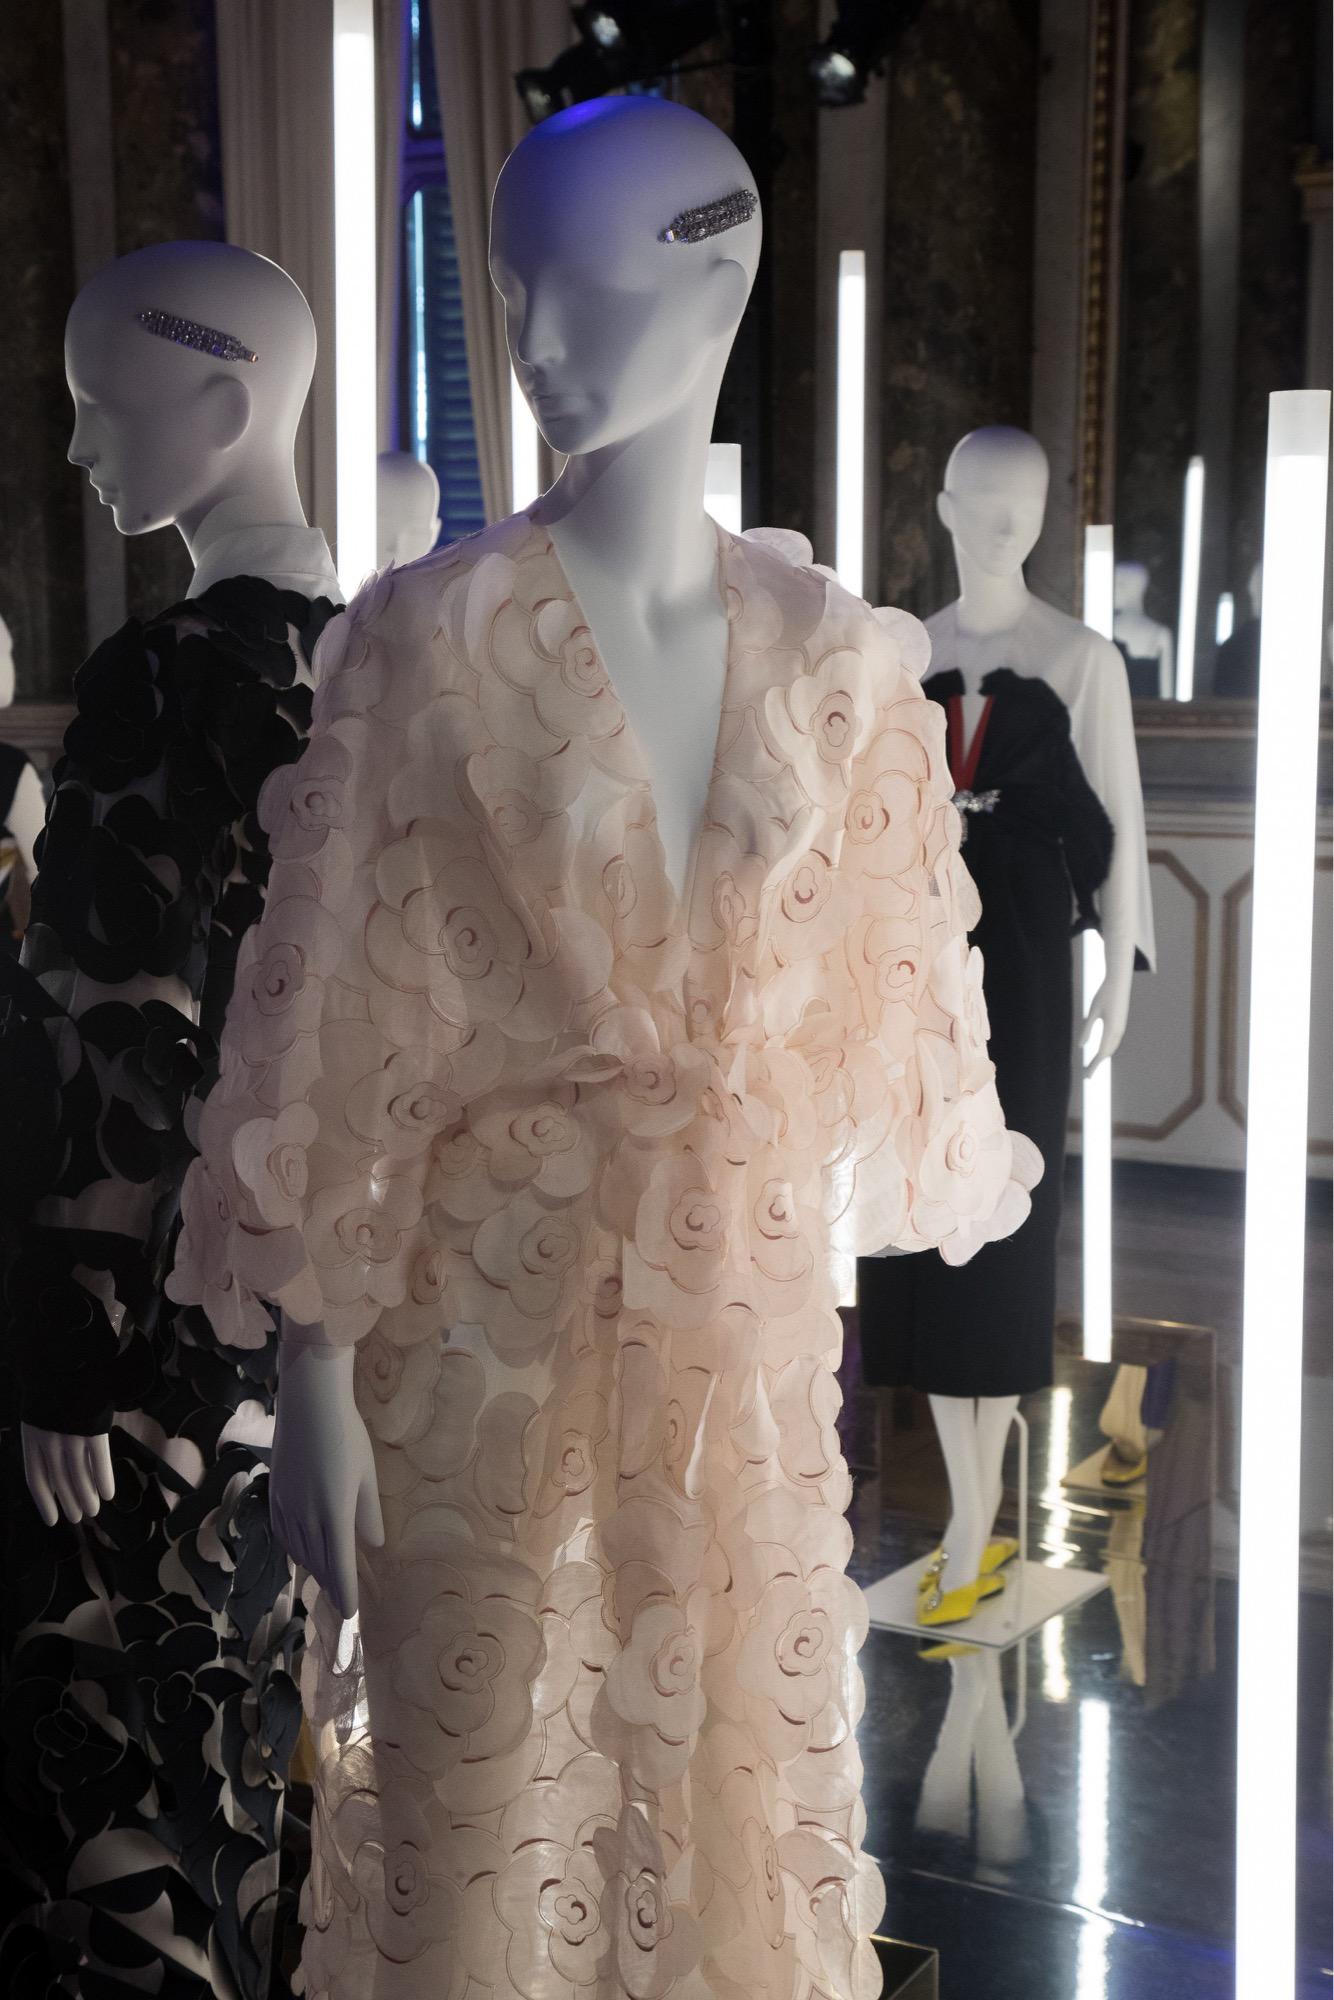 VGrass Studio installation at MIlan Fashion Week with Tribe Mannequins